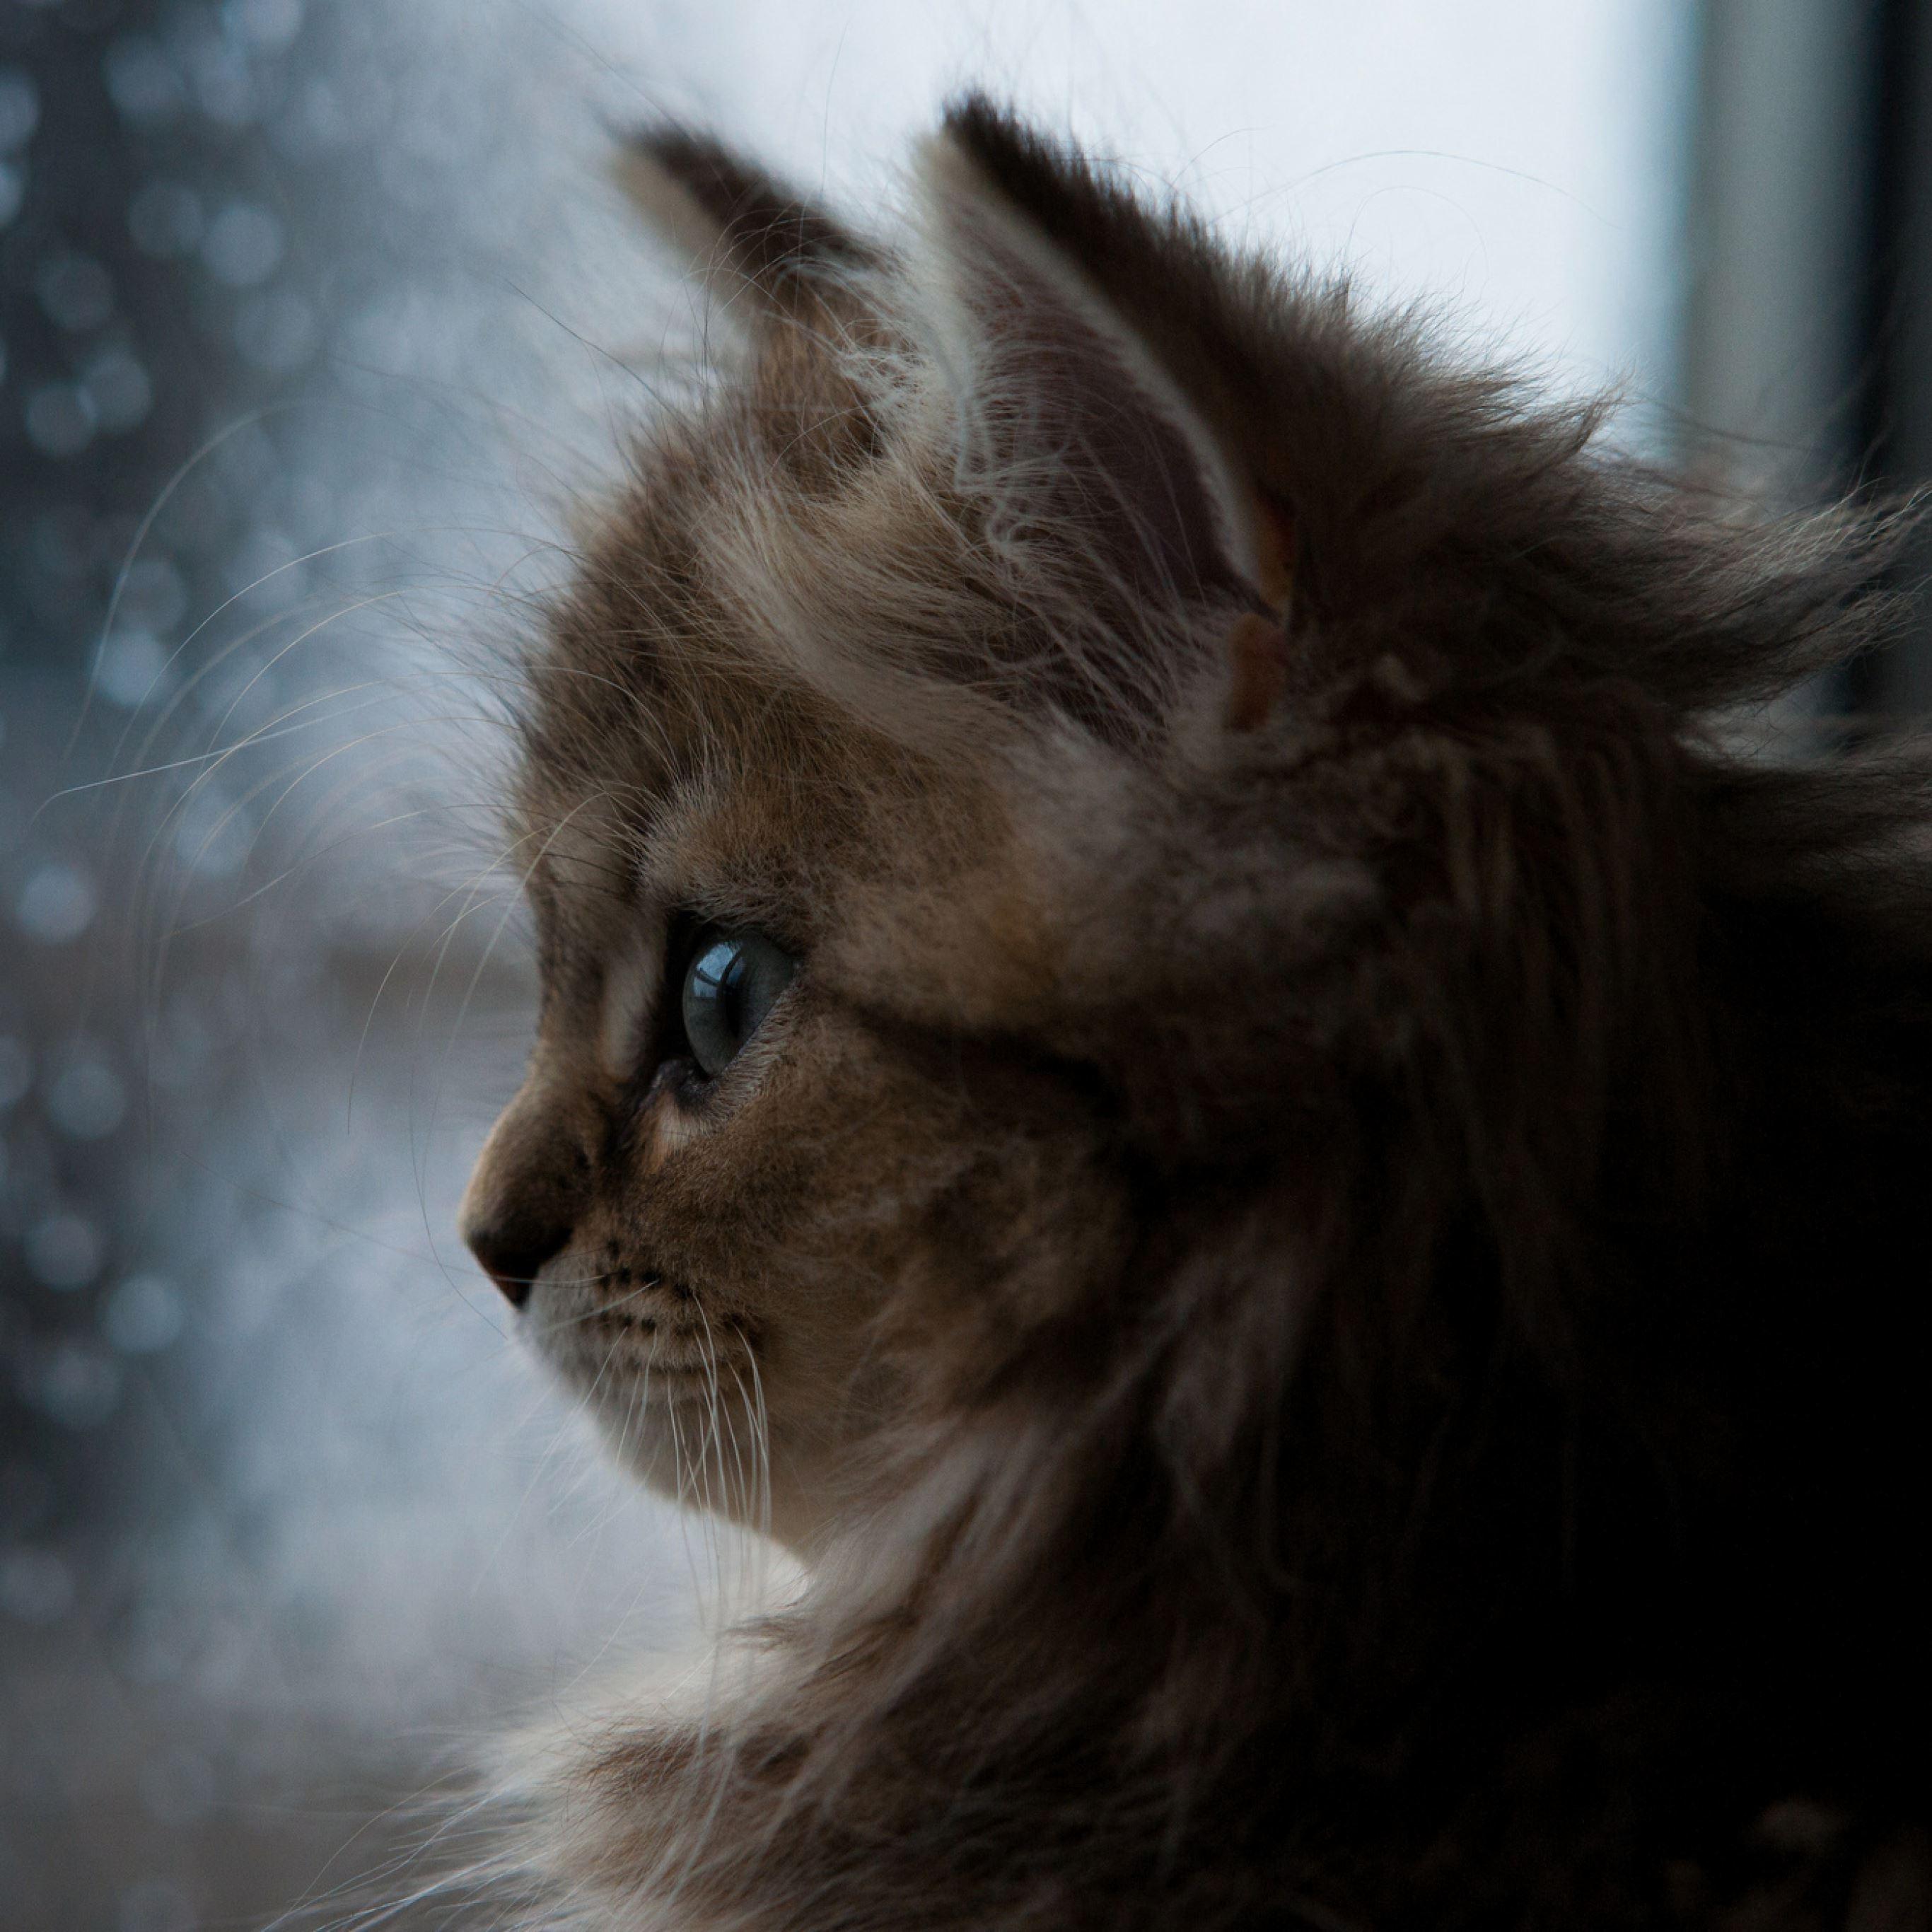 Kitten face window fluffy iPad Pro wallpaper